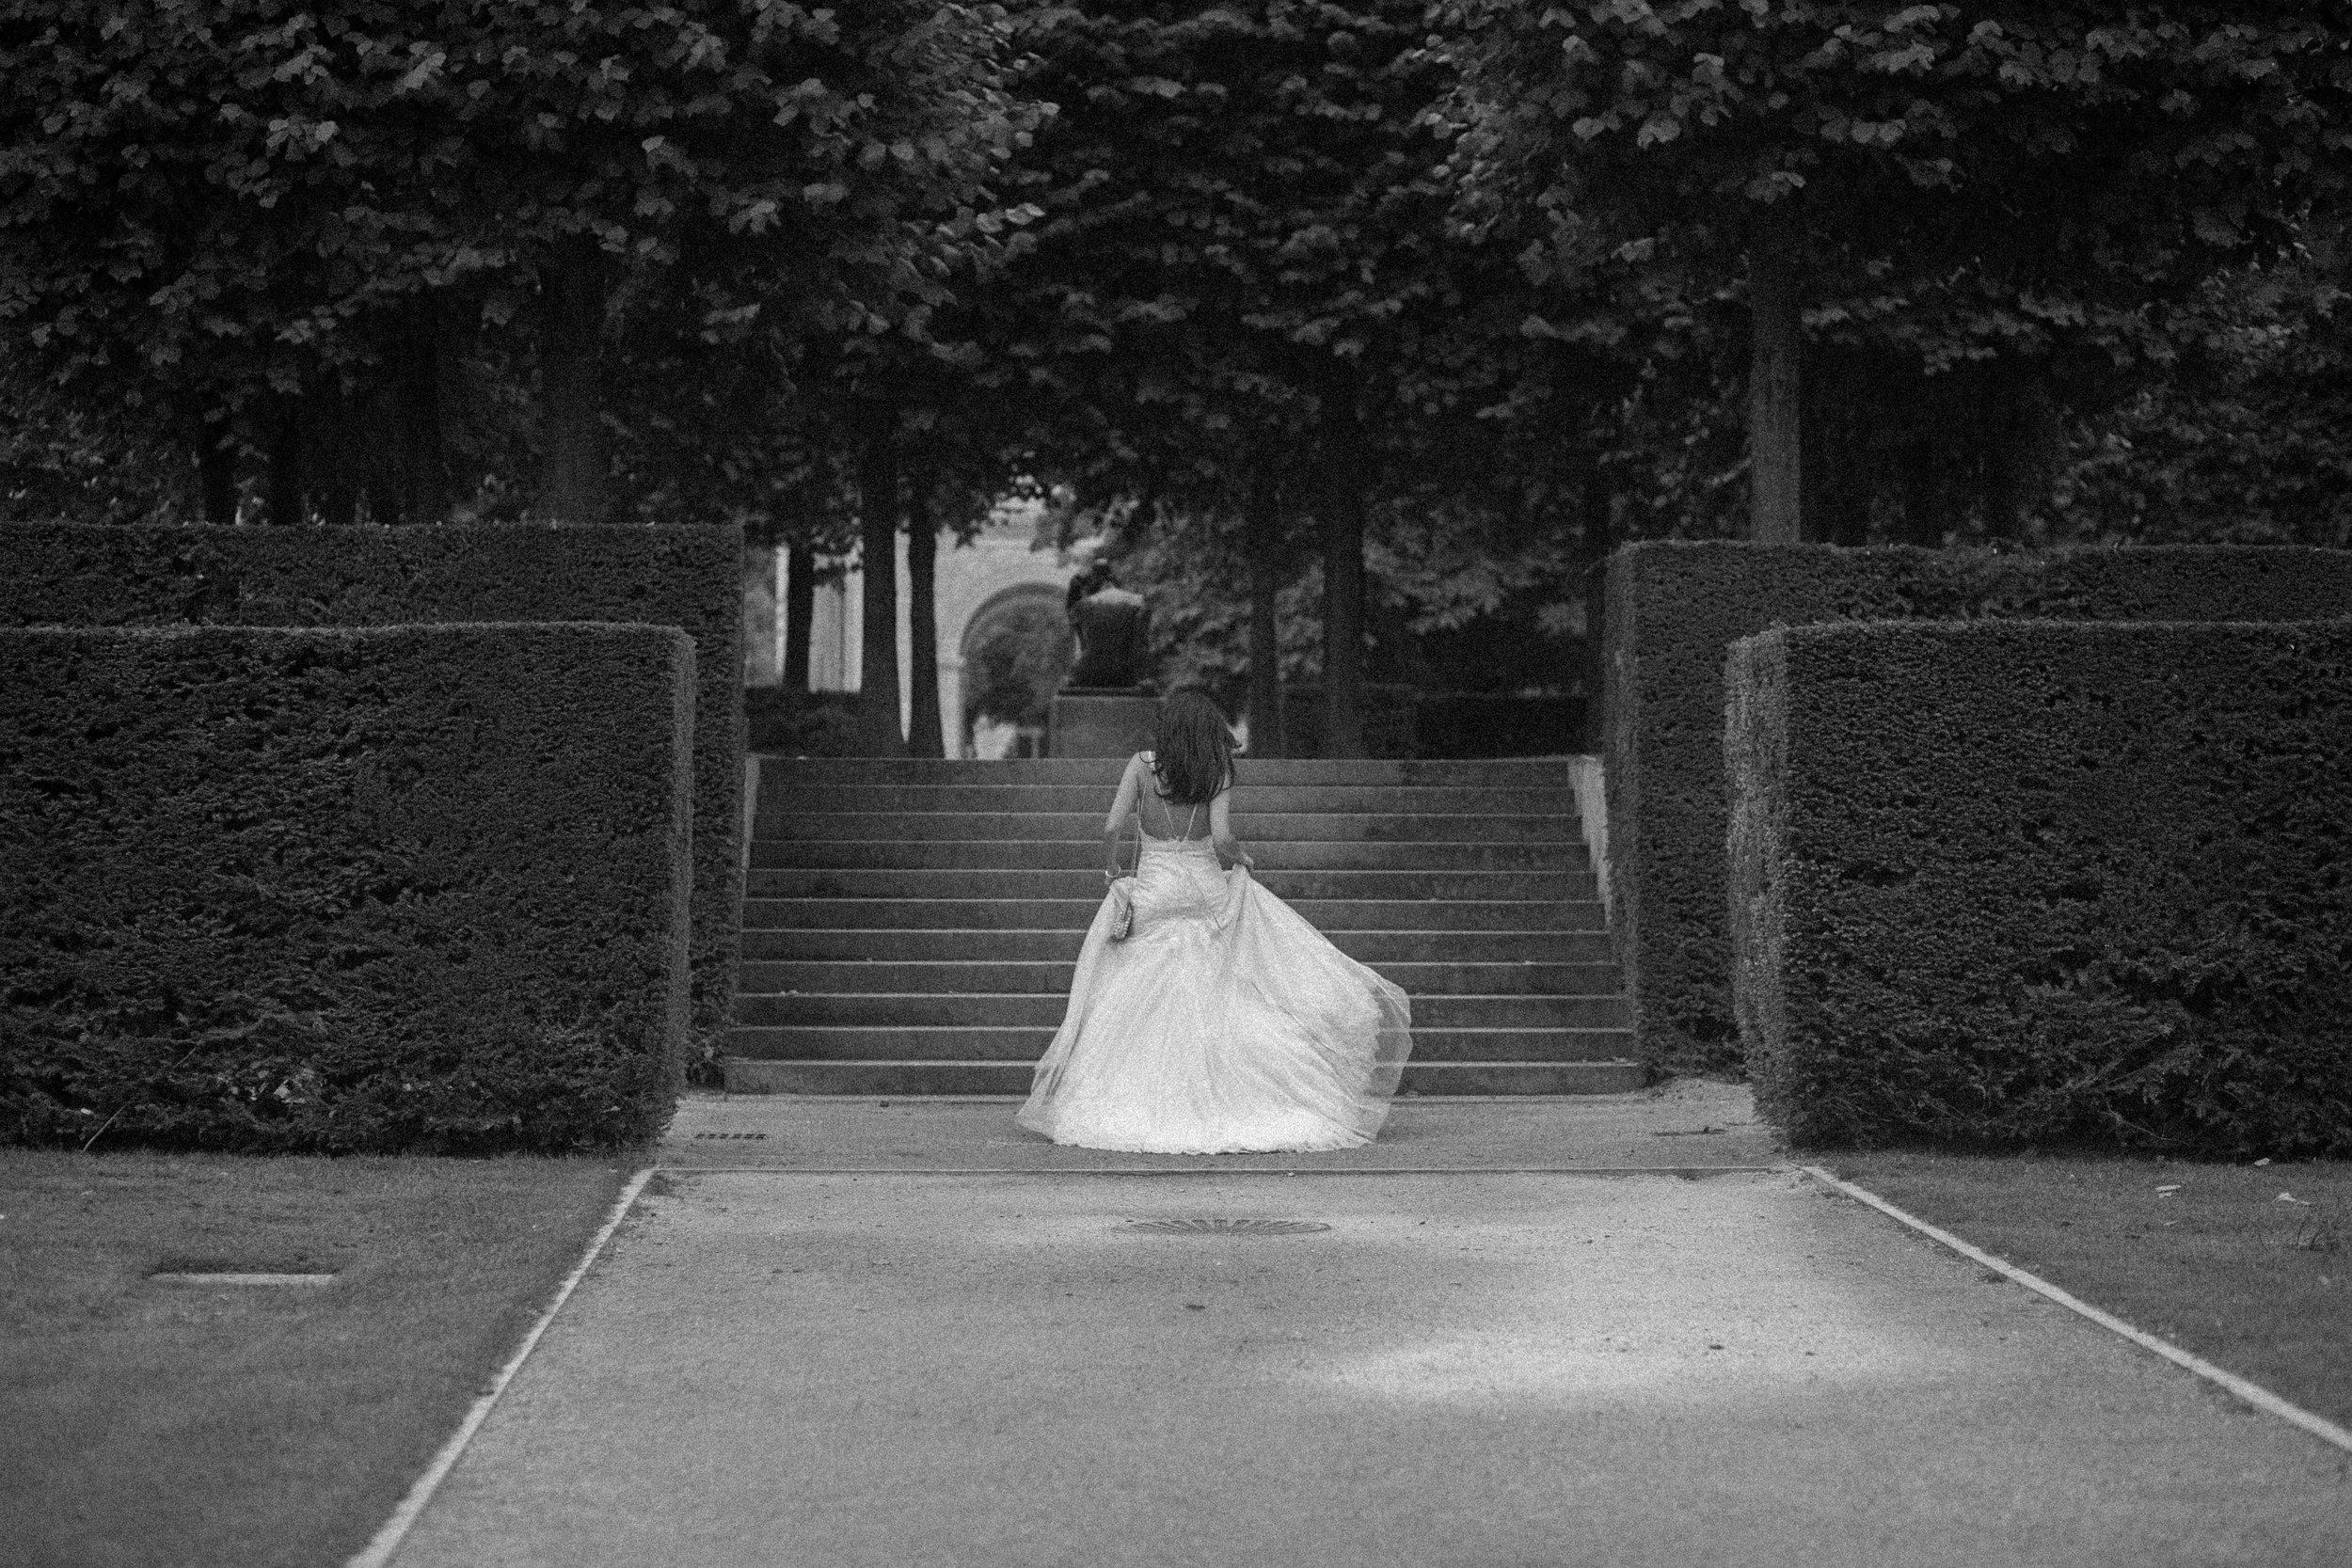 paris wedding photographer craig george hannah and mitch elopment-123.jpg